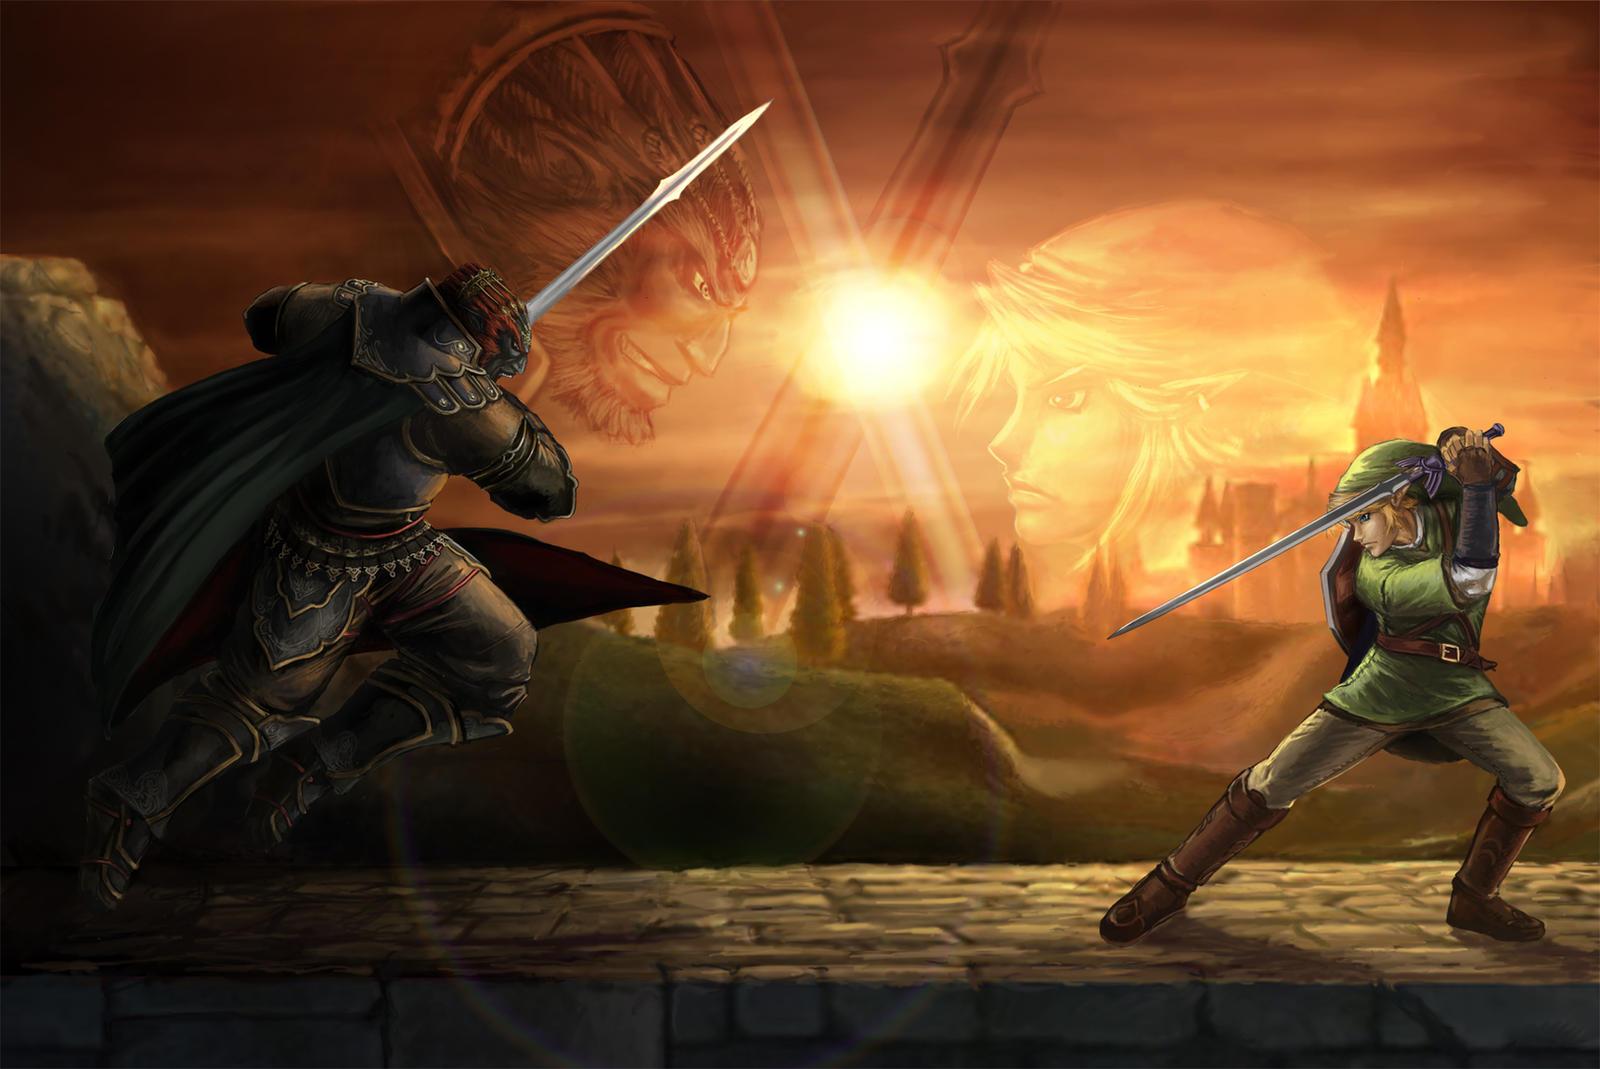 Link vs Ganondorf by YamaOrce